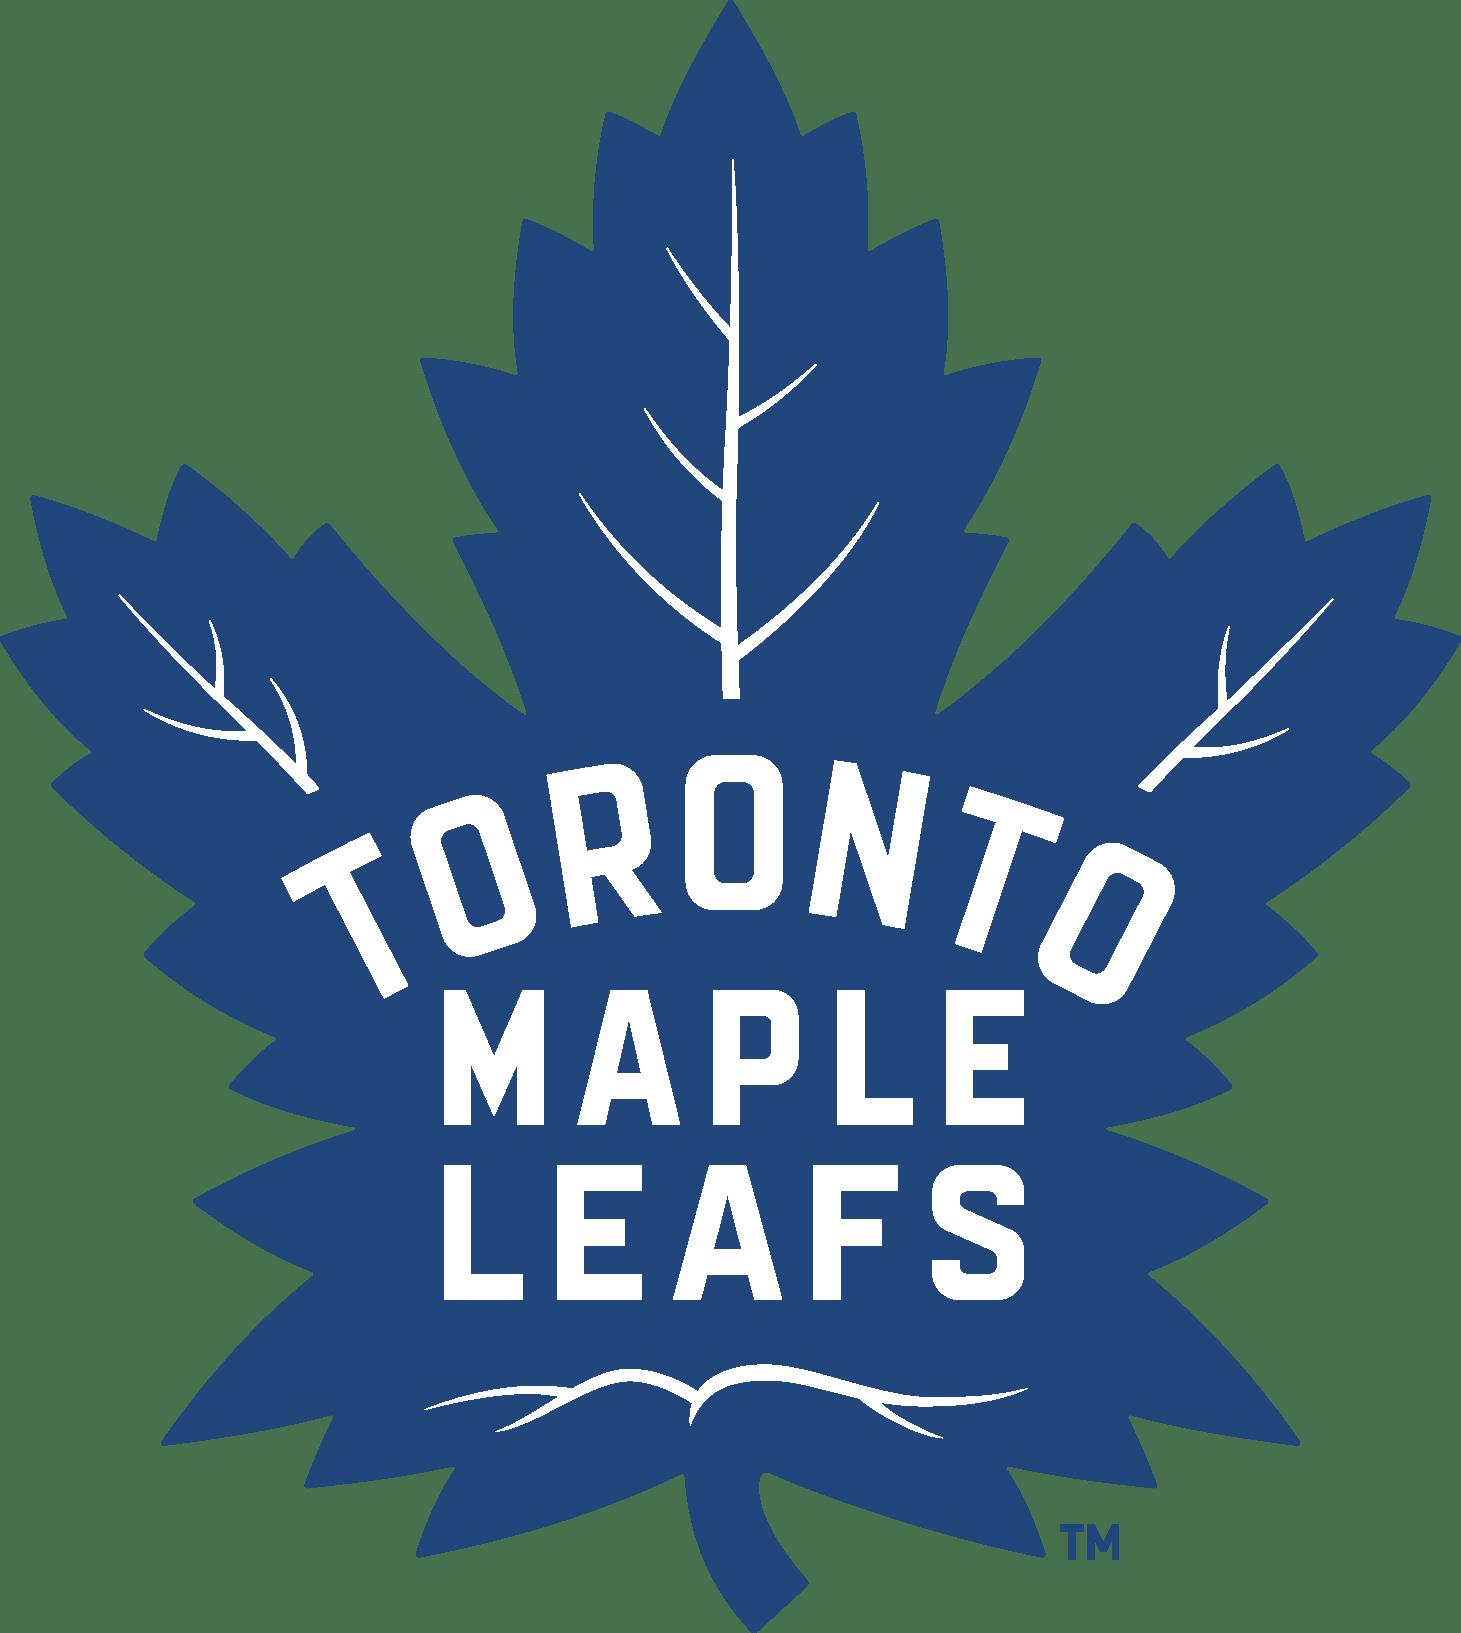 Toronto Maple Leafs Logo [NHL] png